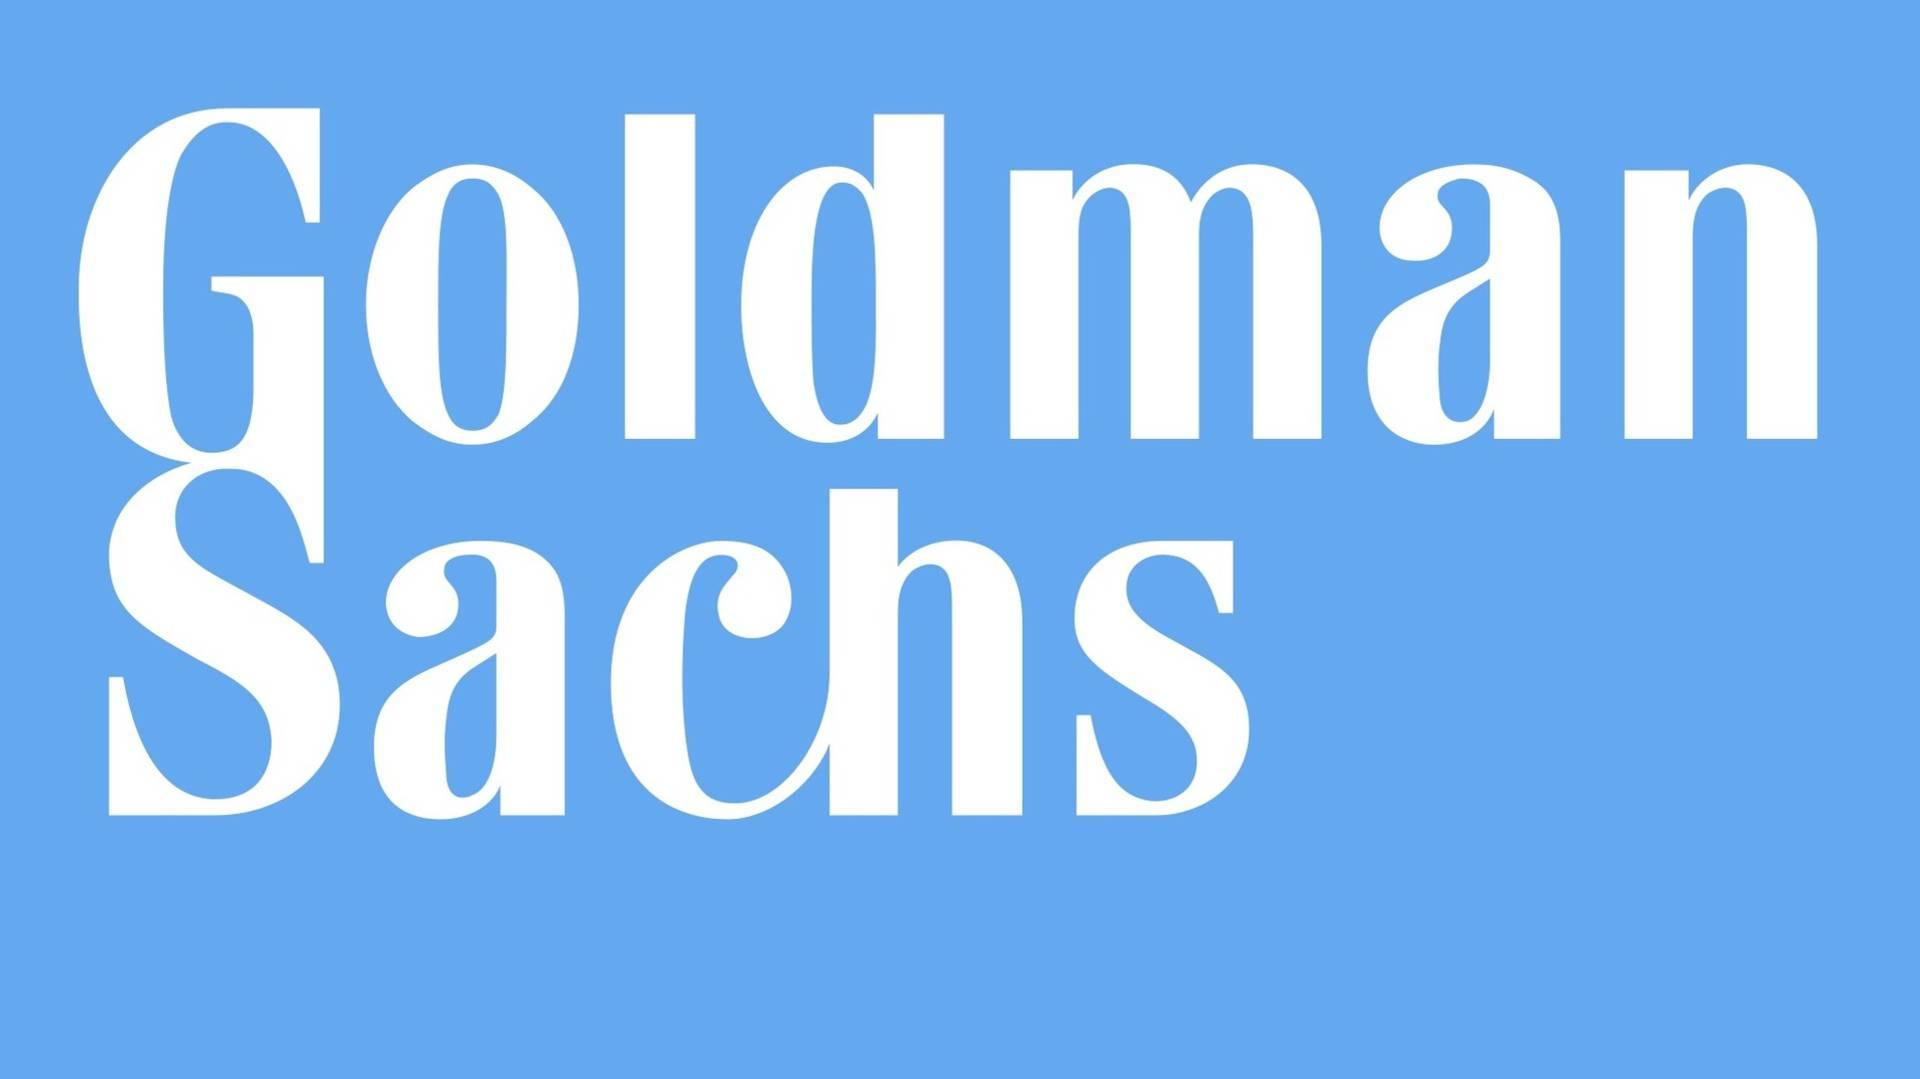 NYSE: GS | Goldman Sachs Group, Inc. (The) Common Stock News, Ratings, and Charts